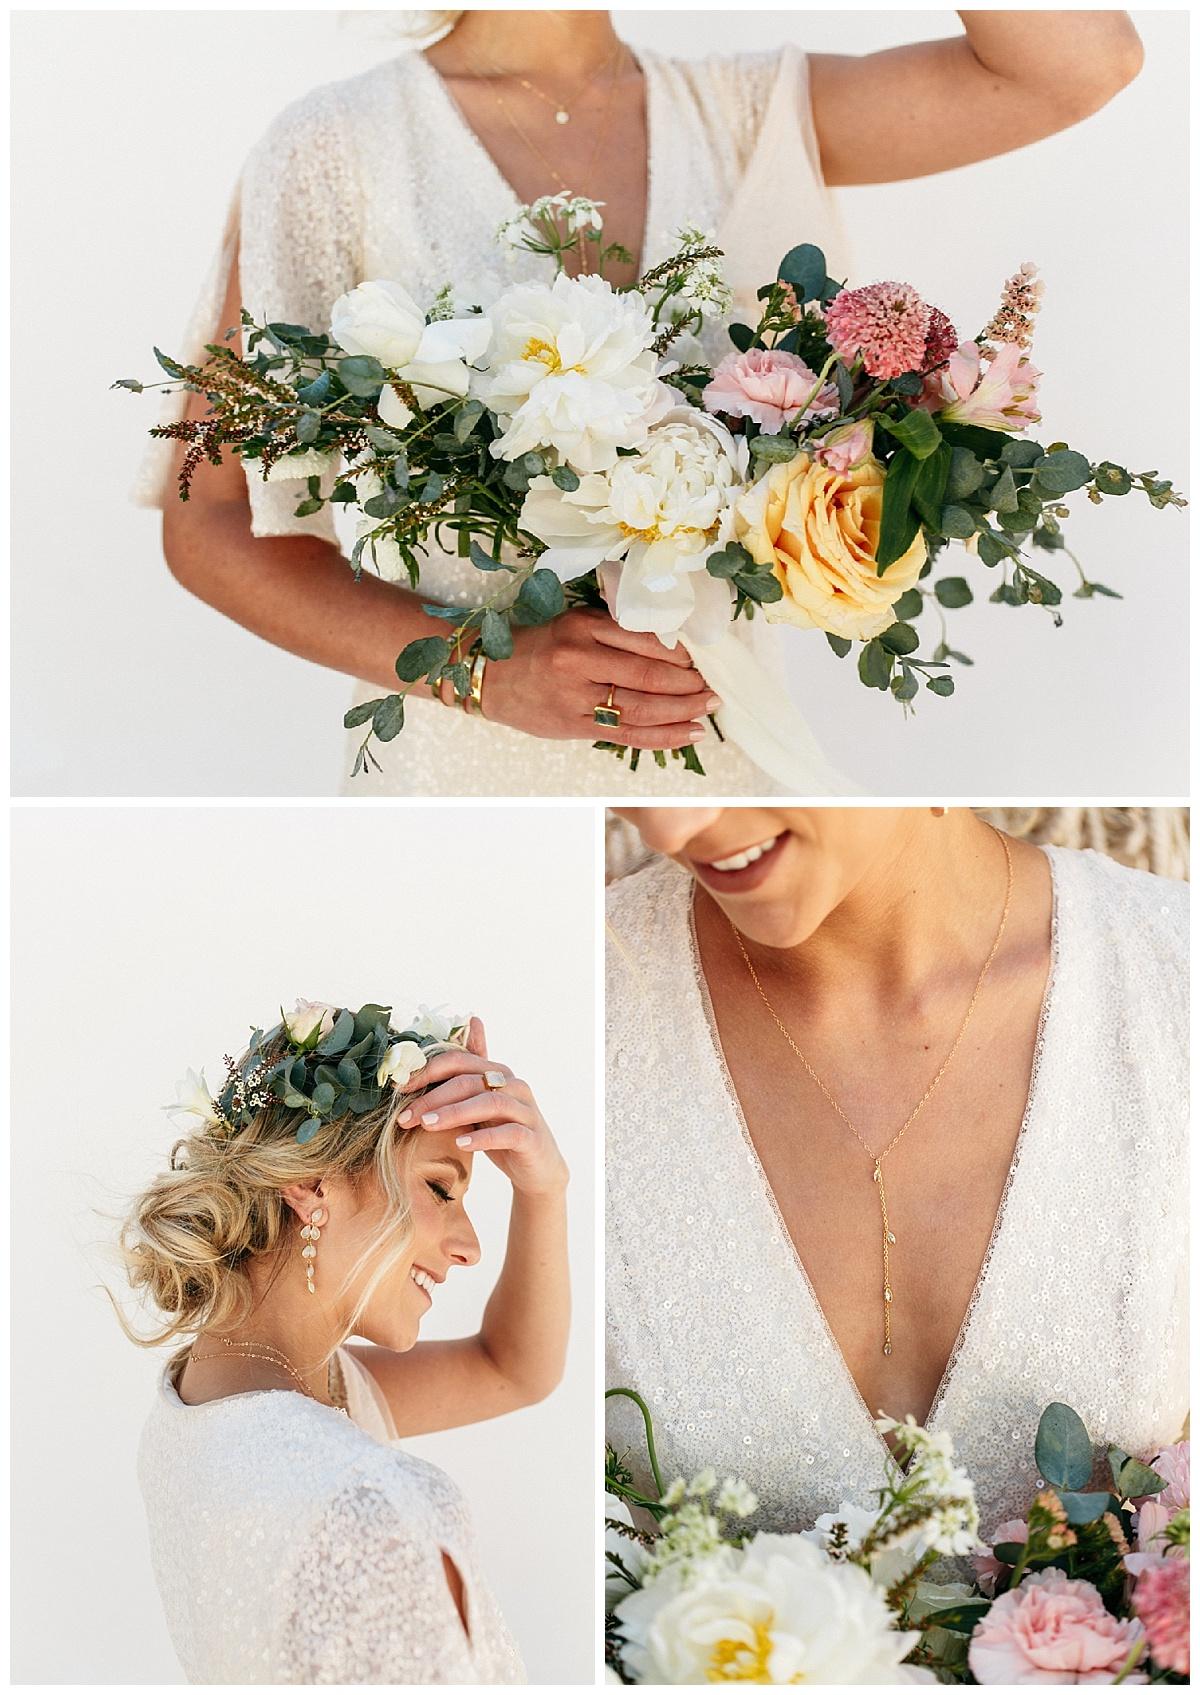 SamErica Studios - modern boho bride - sparkly wedding dress - minimalist bridal jewelry